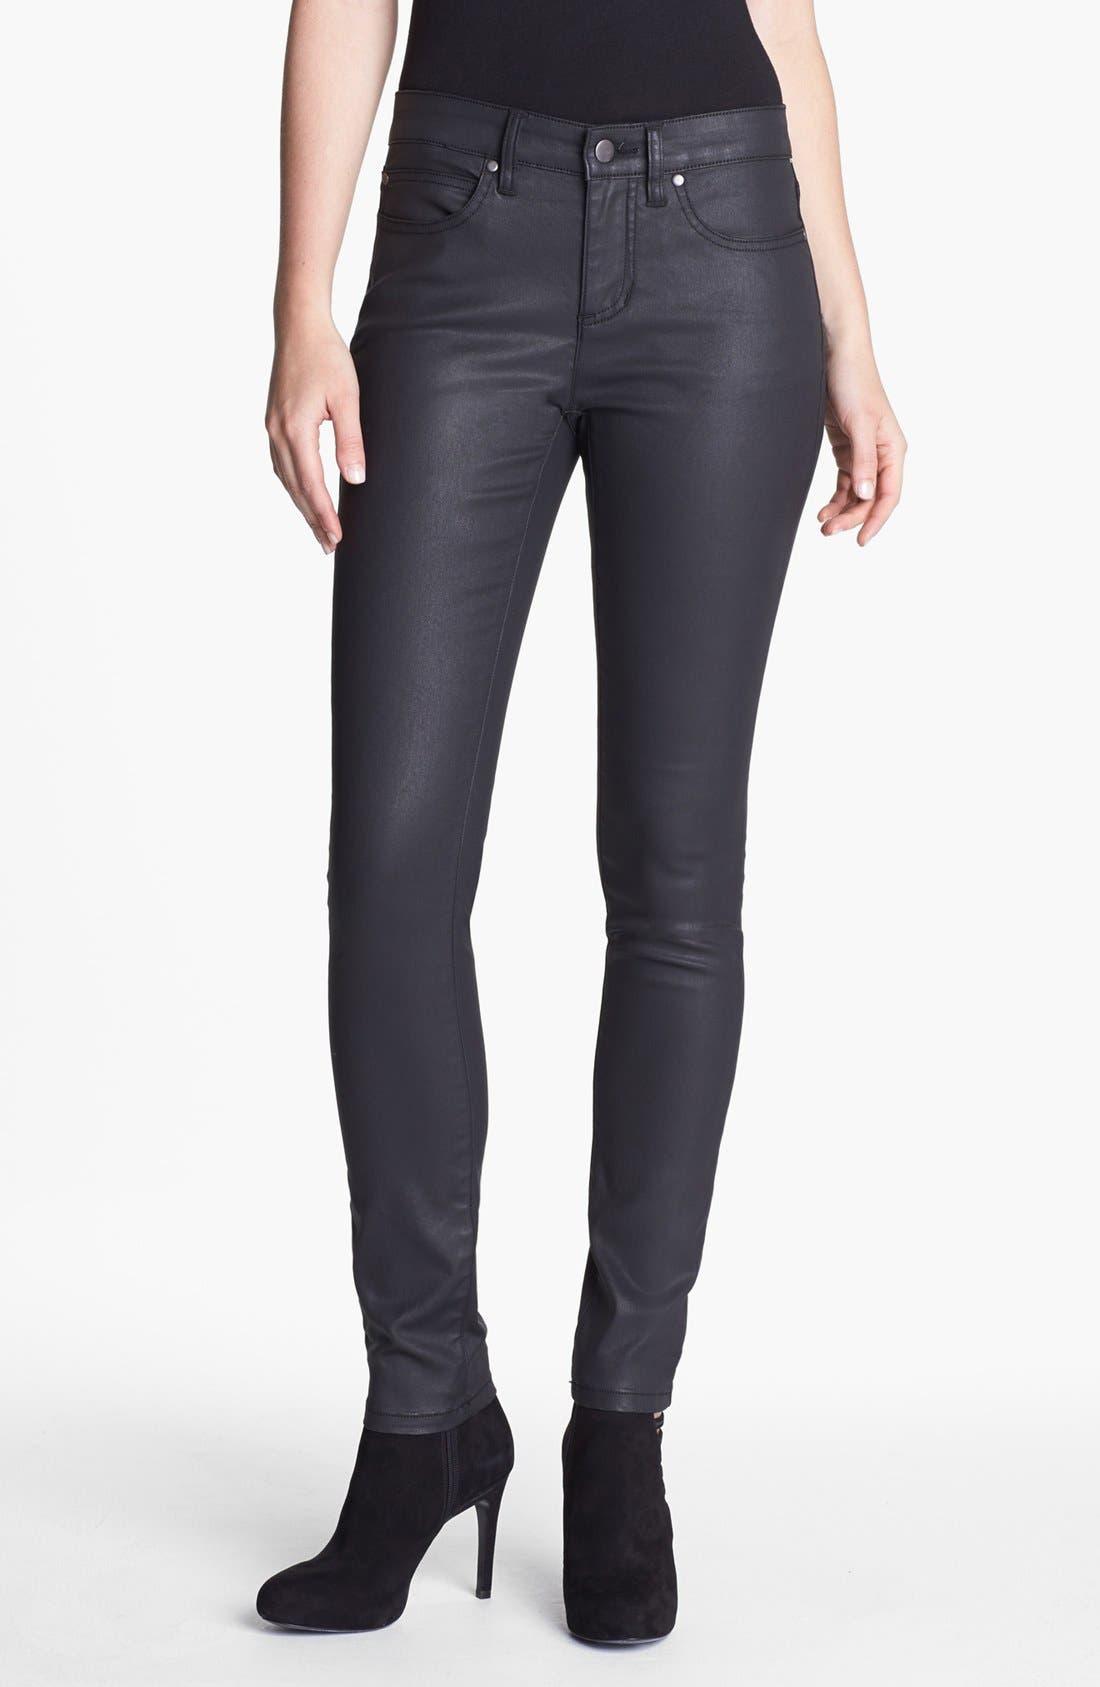 Alternate Image 1 Selected - Eileen Fisher Waxed Denim Skinny Jeans